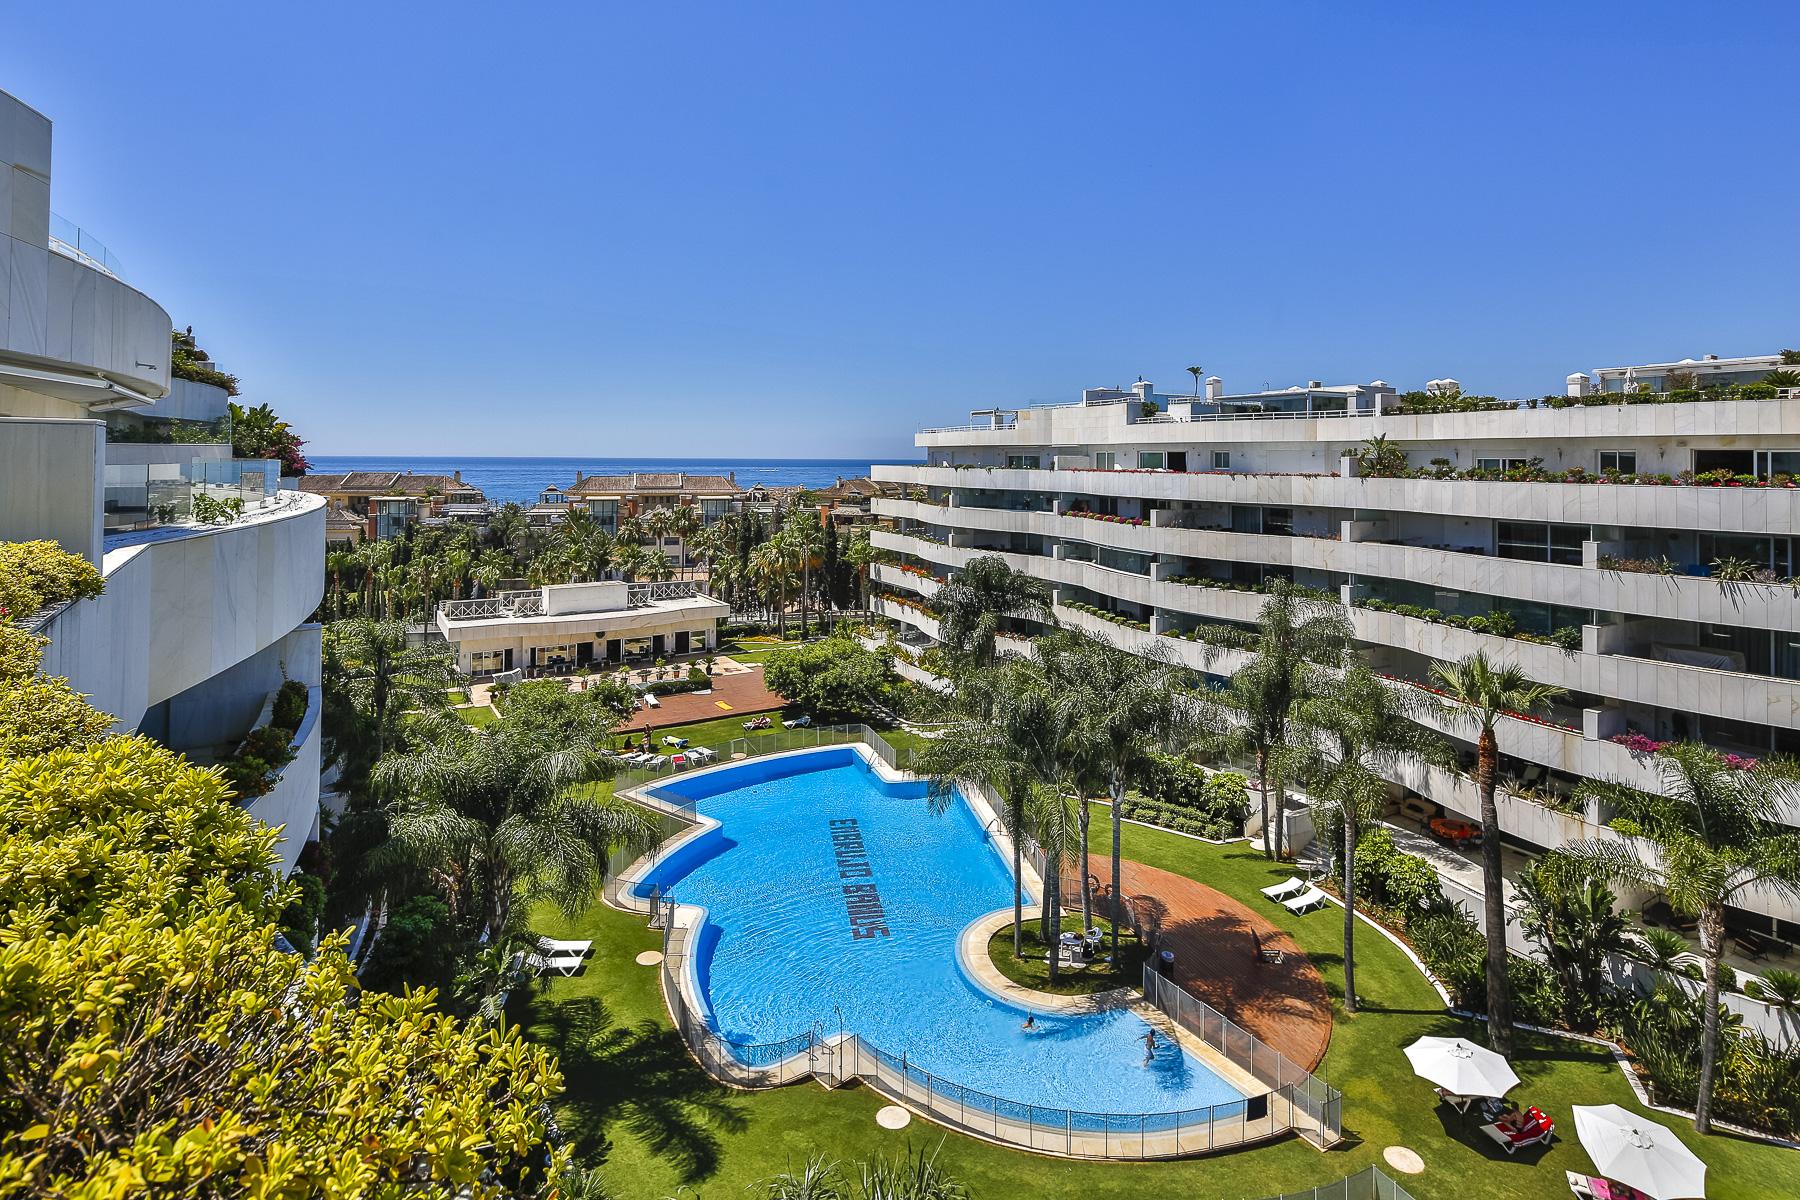 Duplex Penthouse for Sale and Rent in El Embrujo BanÌ_s, Marbella - Puerto Banus